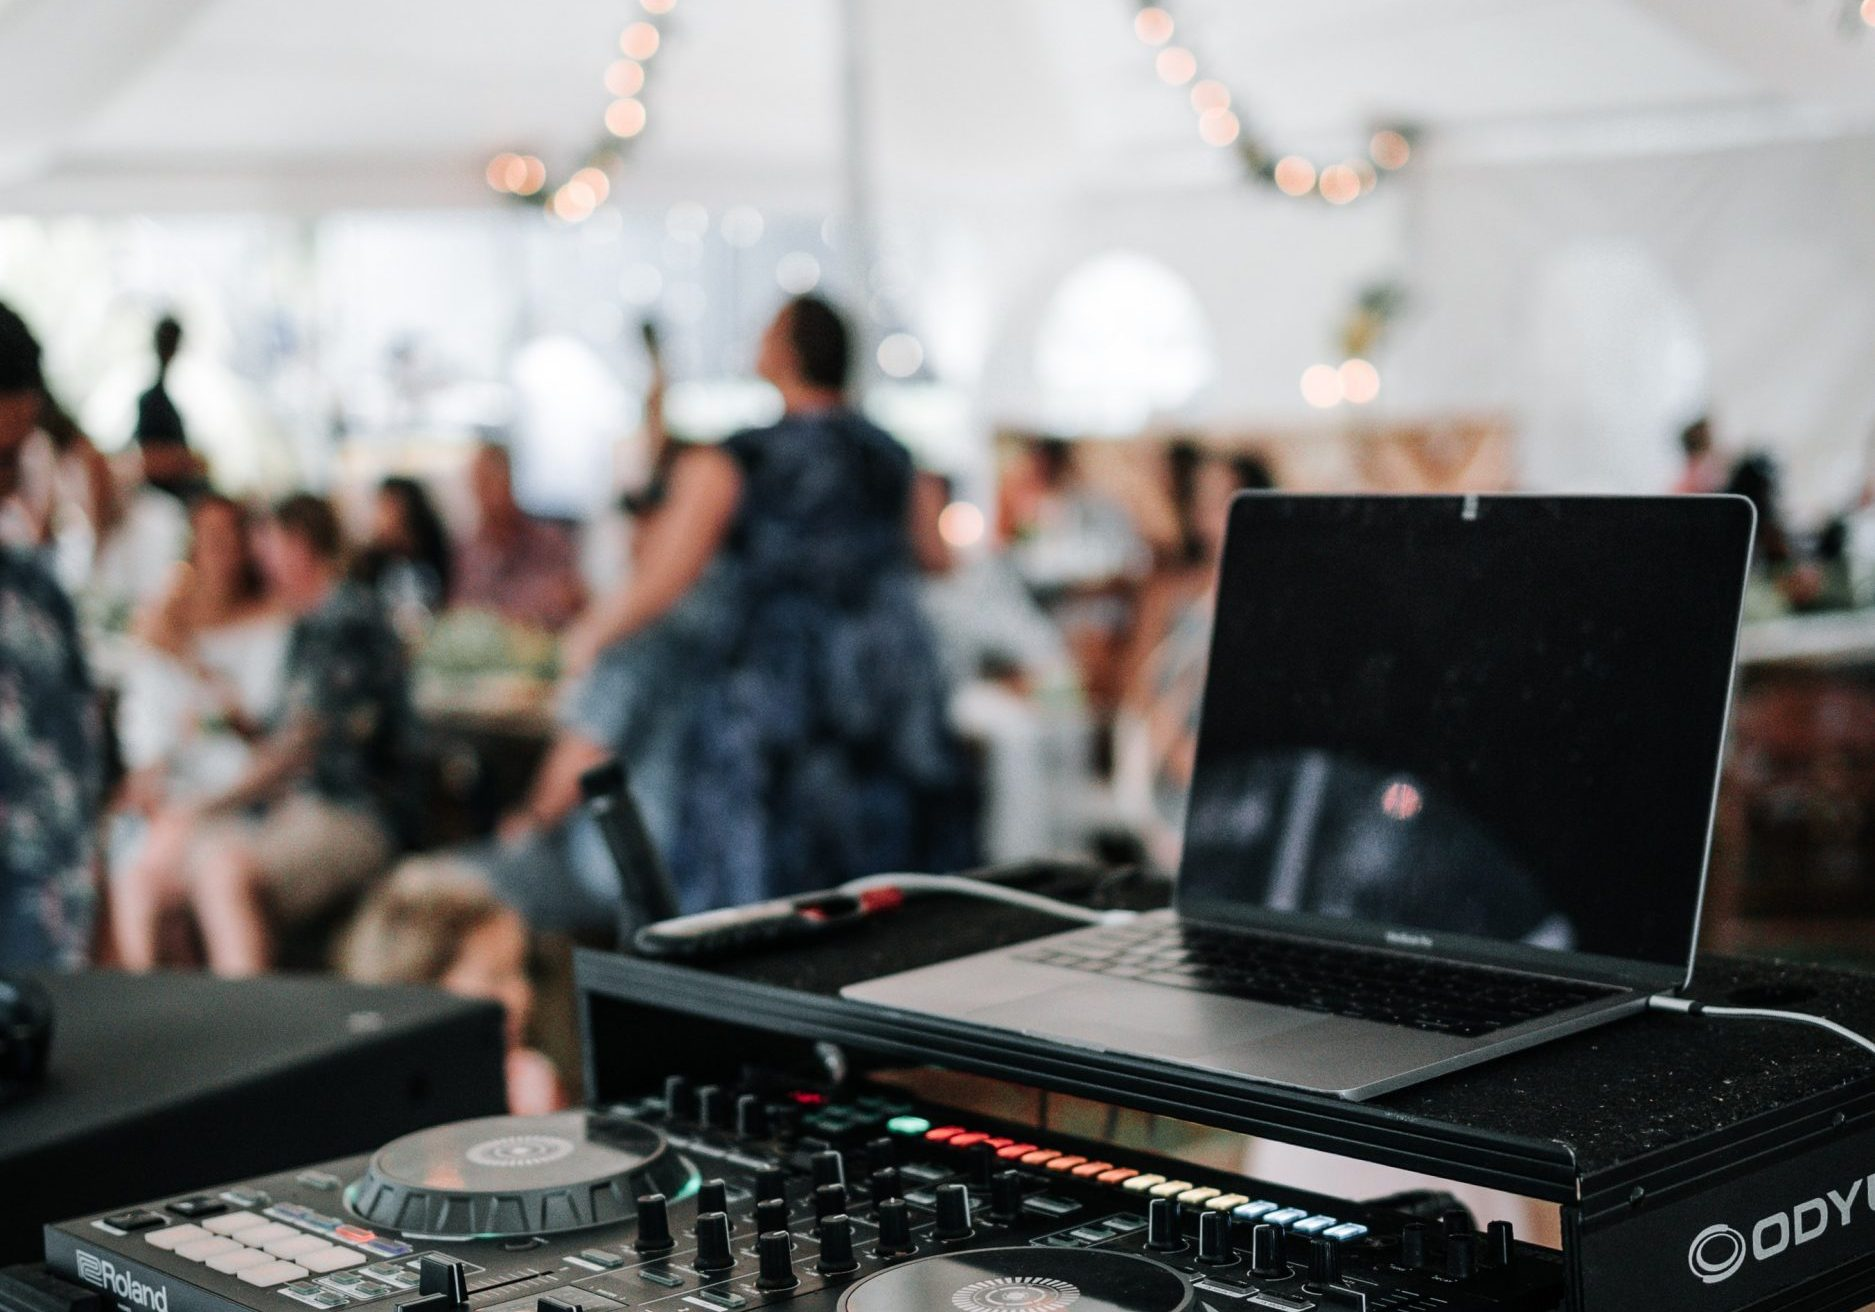 DJ set-up used as wedding entertainment